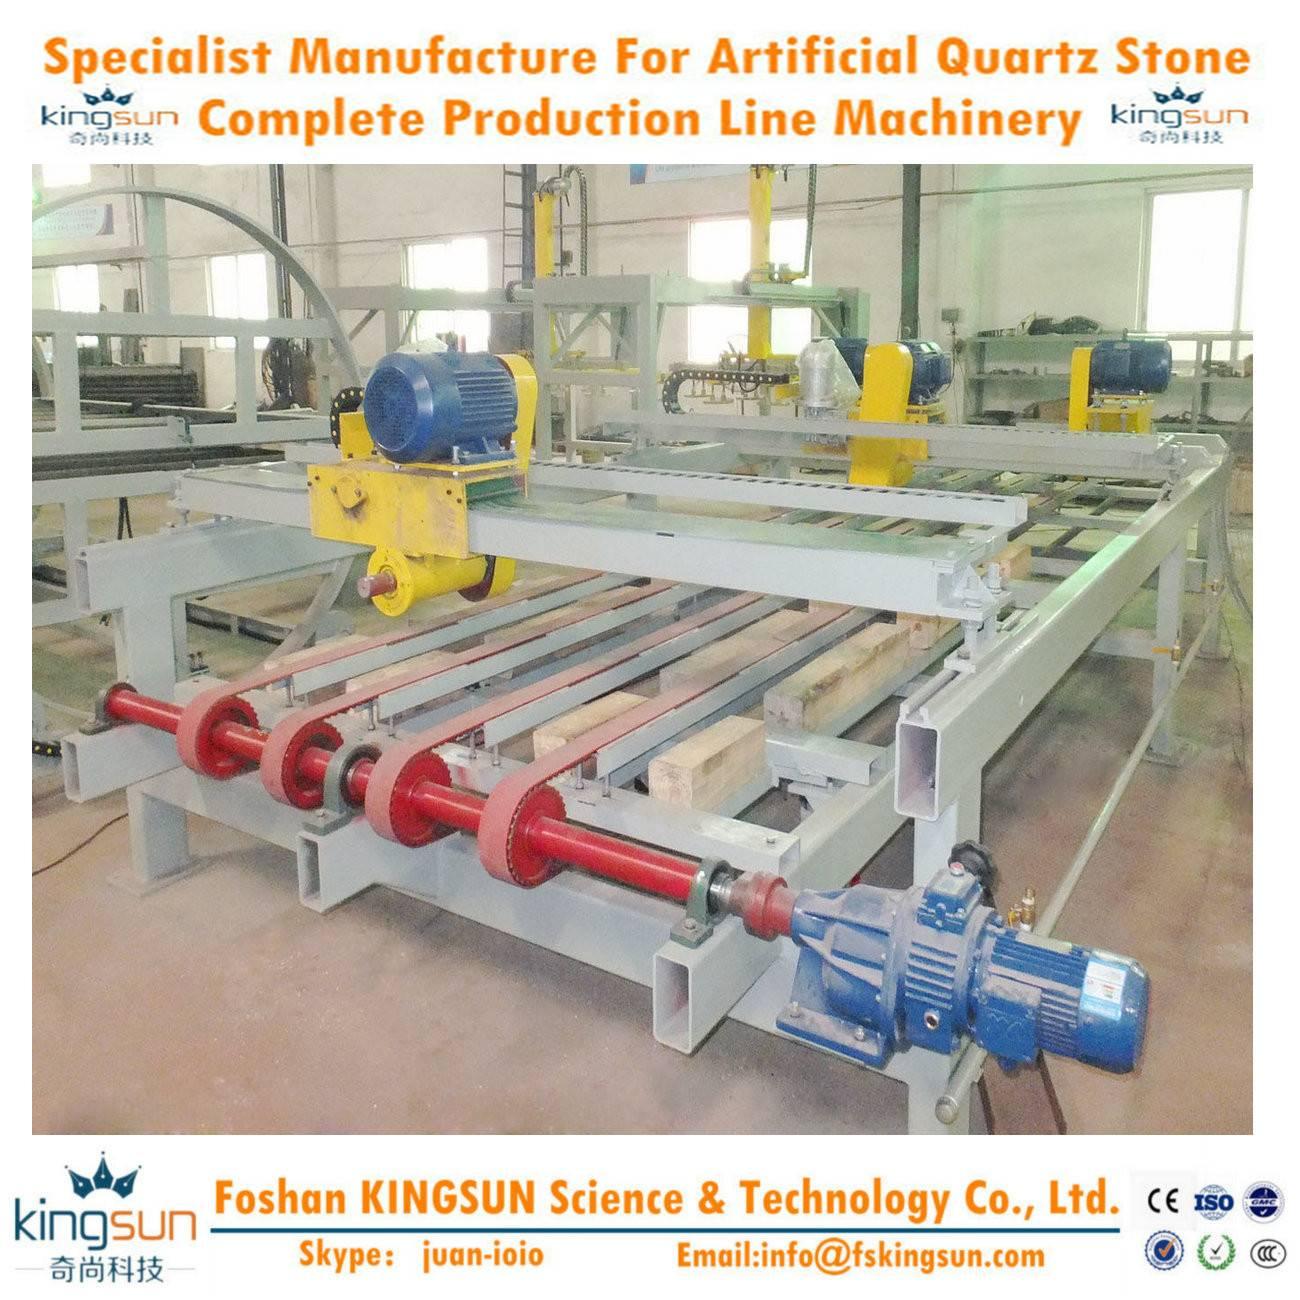 Auto Lengthways and Crosswise Cutting Device/ Quartz Stone Cutting Machine